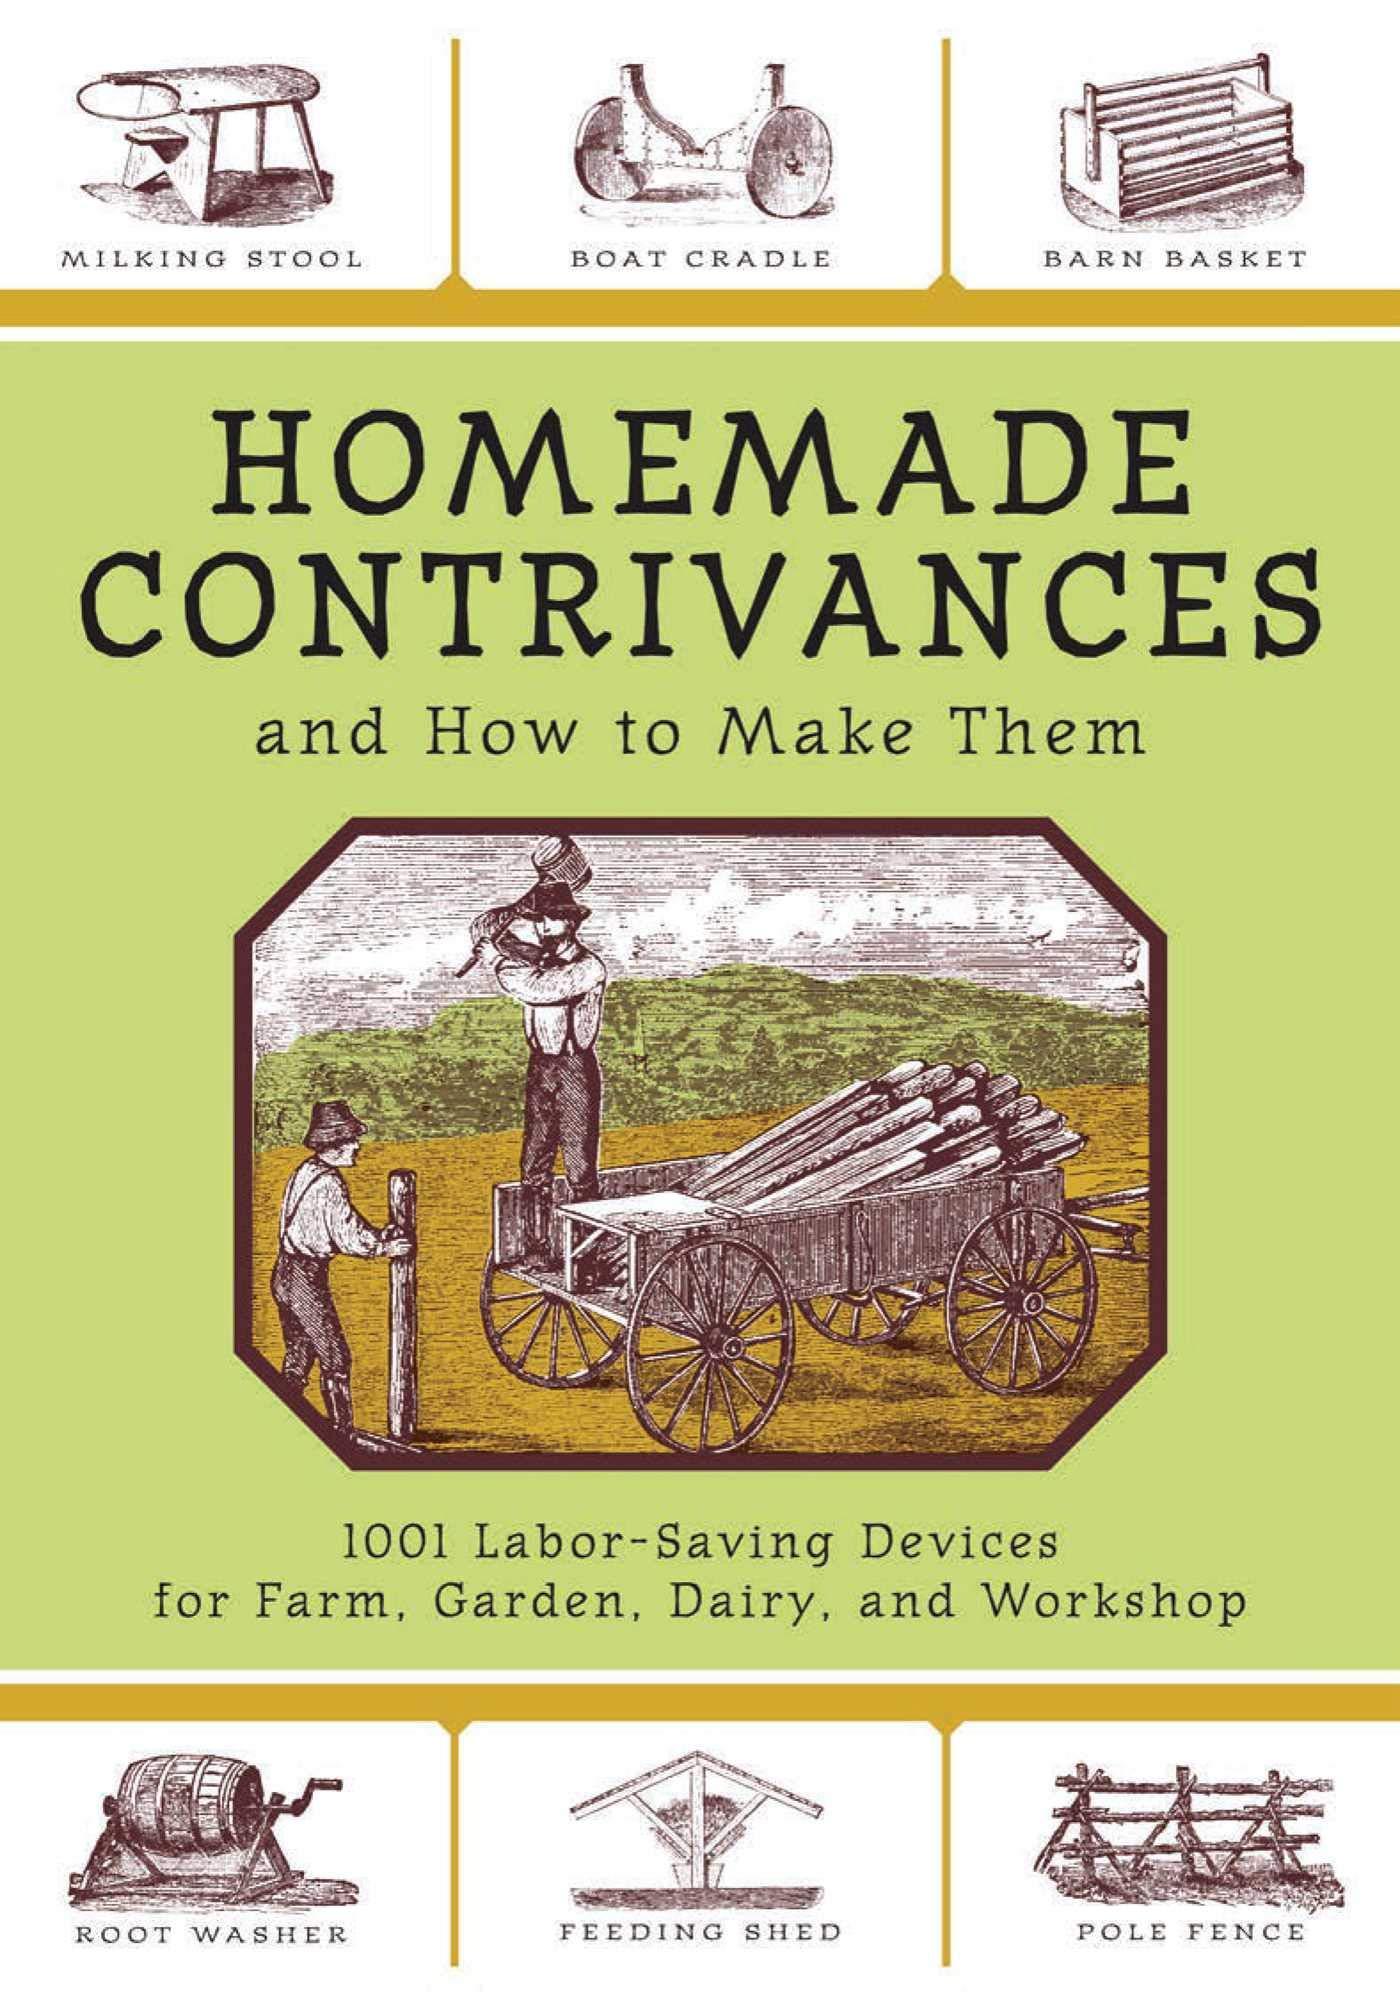 Homemade Contrivances  1001 Labor Saving Devices For Farm Garden Diary And Workshop  1001 Labor Saving Devices For Farm Garden Dairy And Workshop